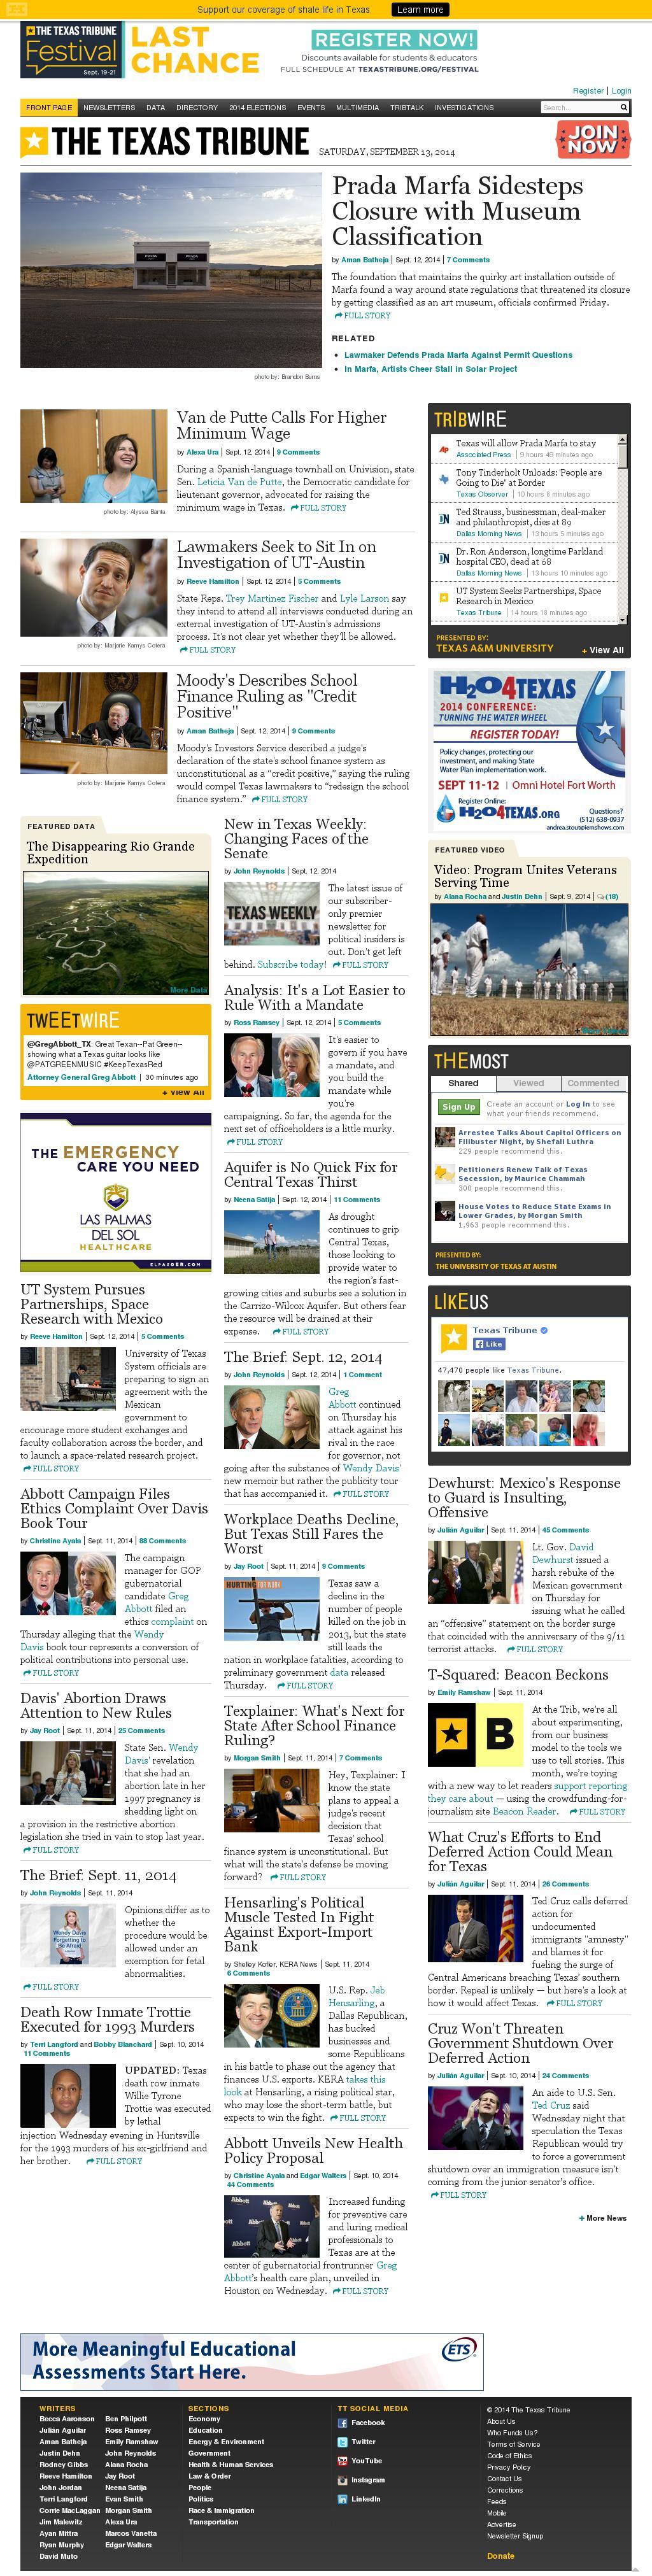 The Texas Tribune at Saturday Sept. 13, 2014, 5:18 a.m. UTC